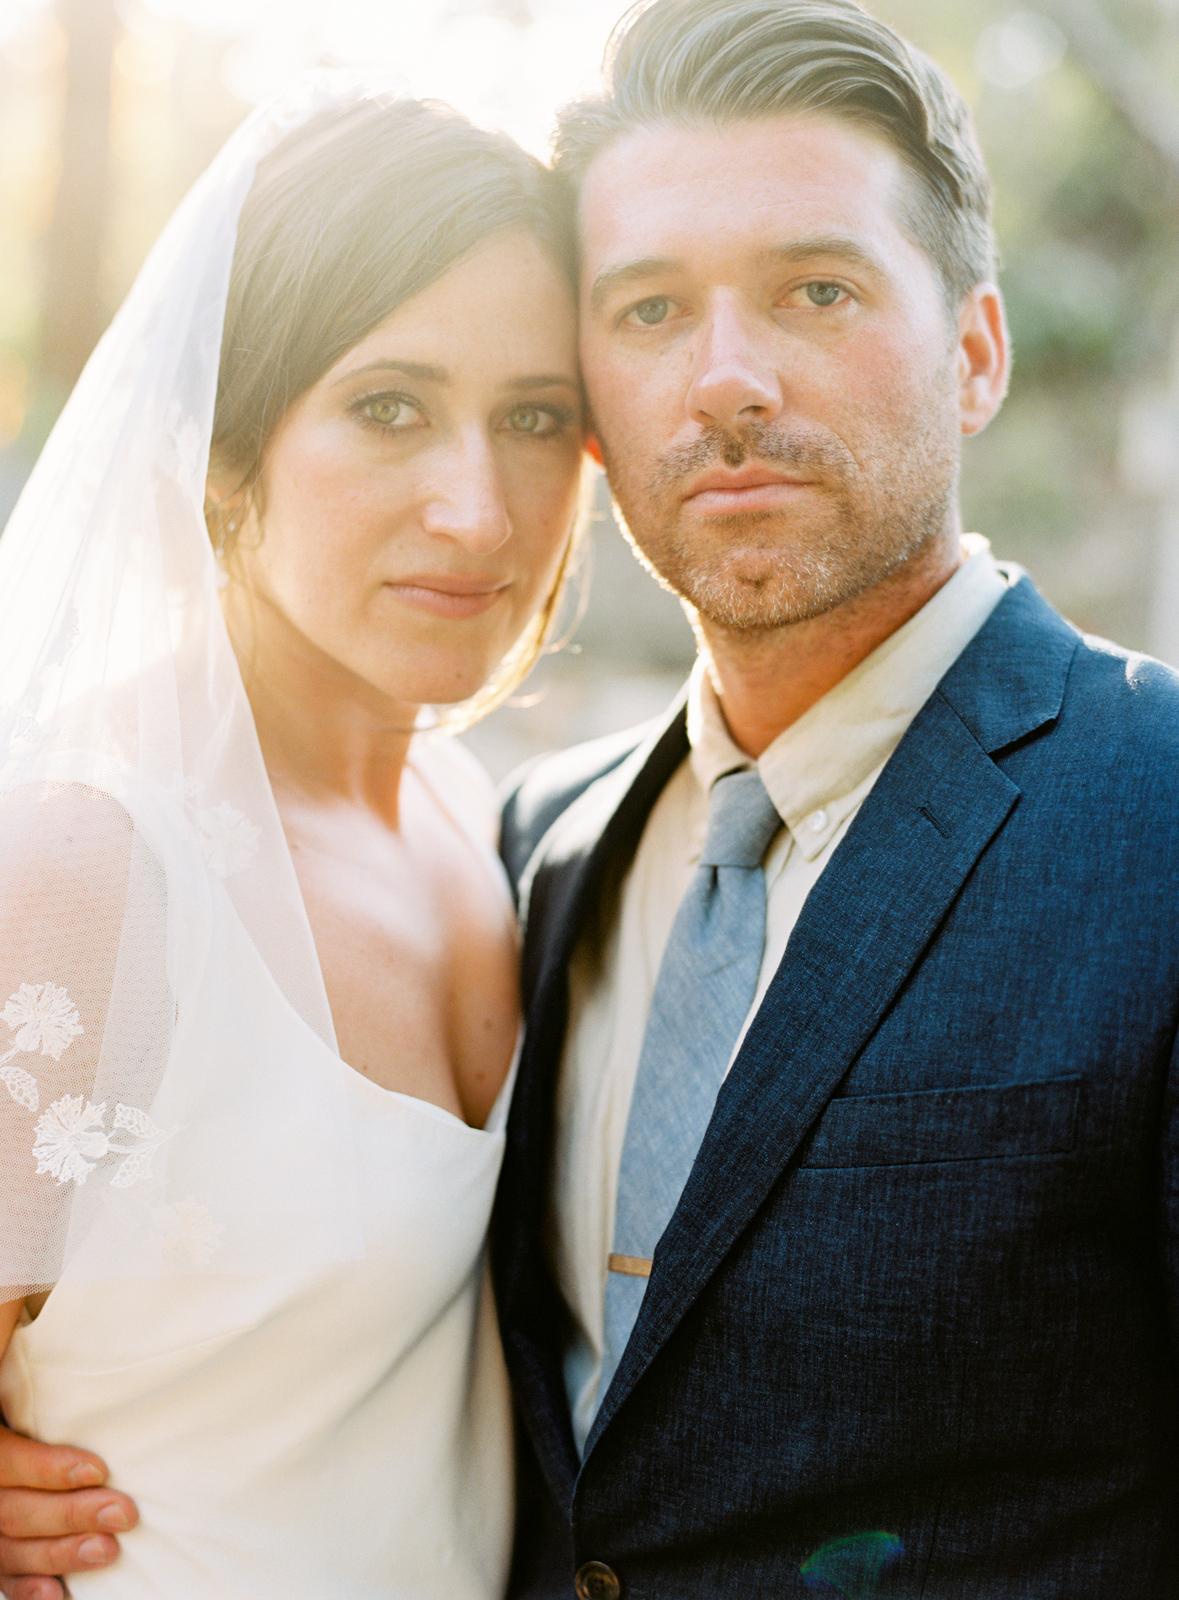 film_wedding_photographer_037.jpg